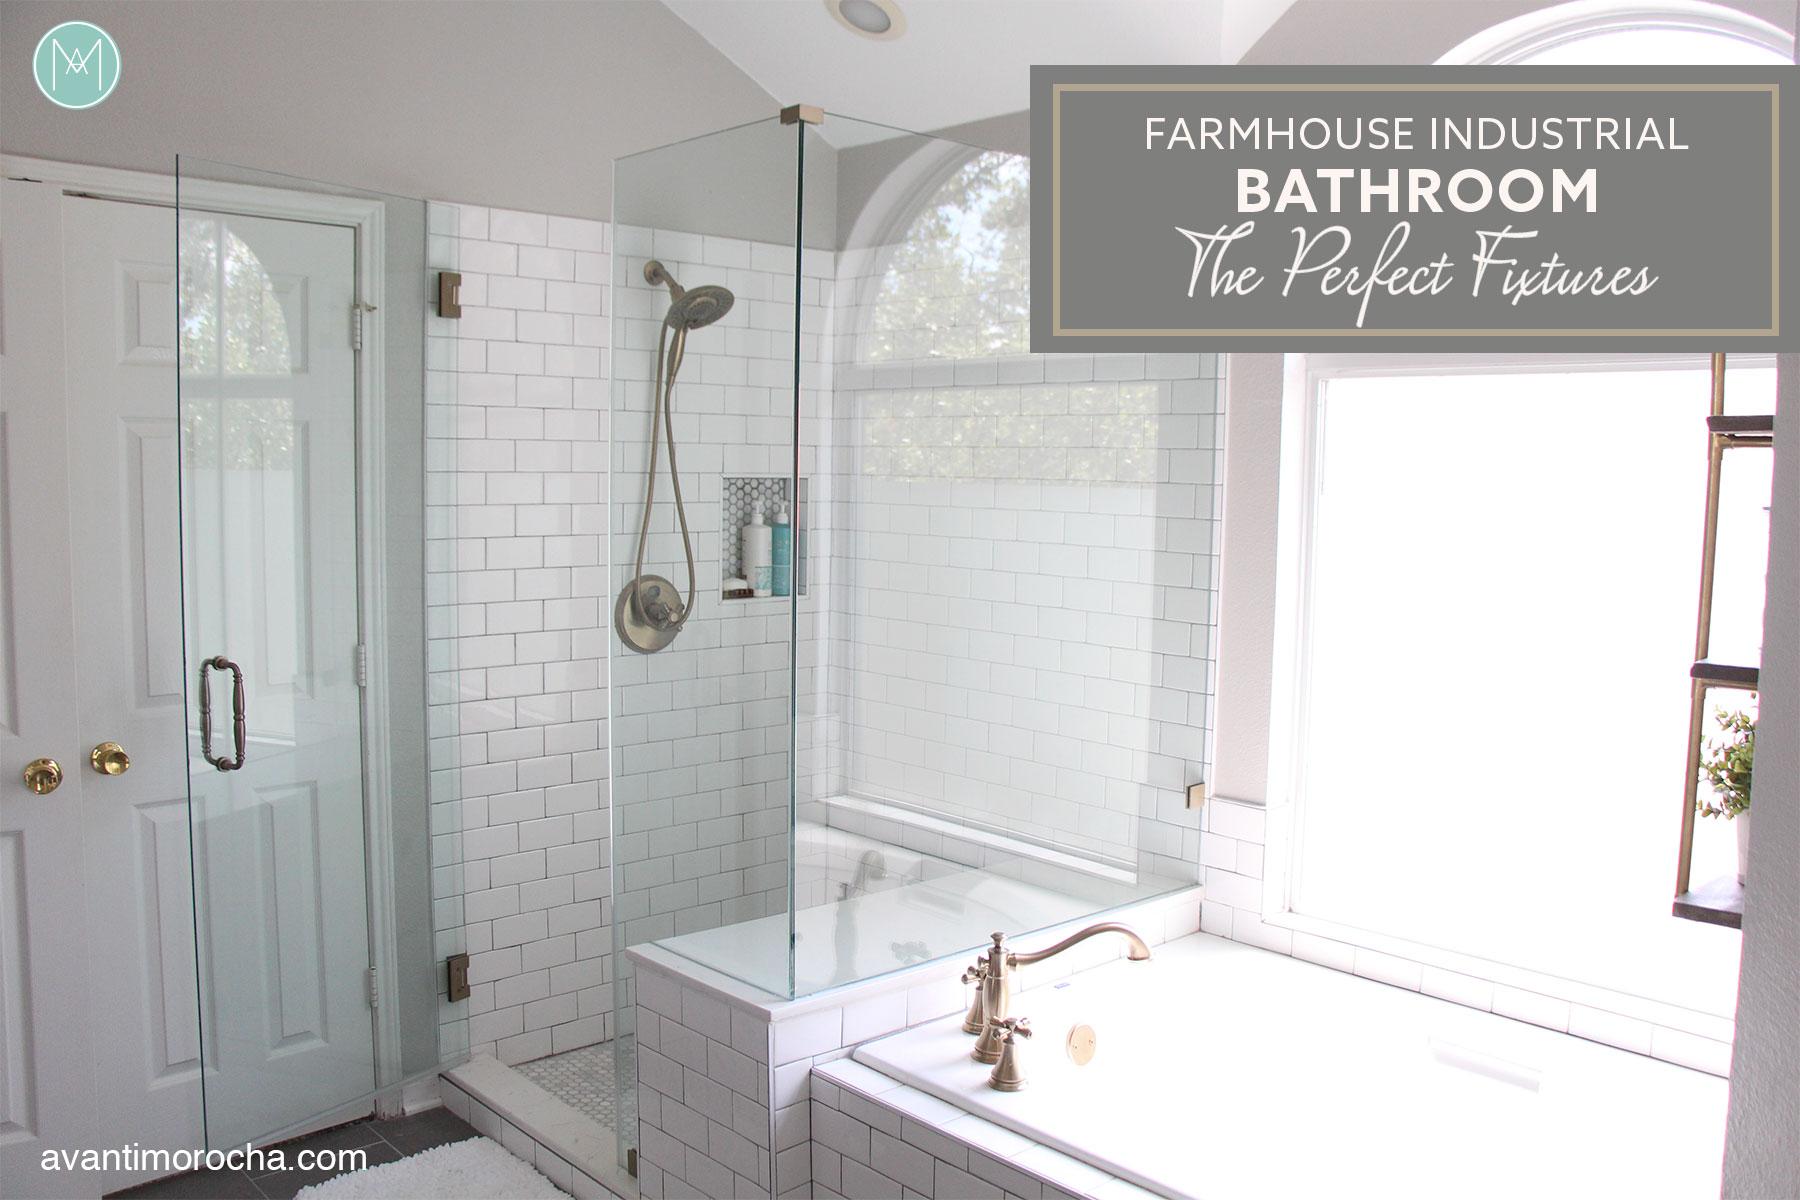 Industrial Farmhouse Bathroom - The Perfect Fixtures - Avanti Morocha